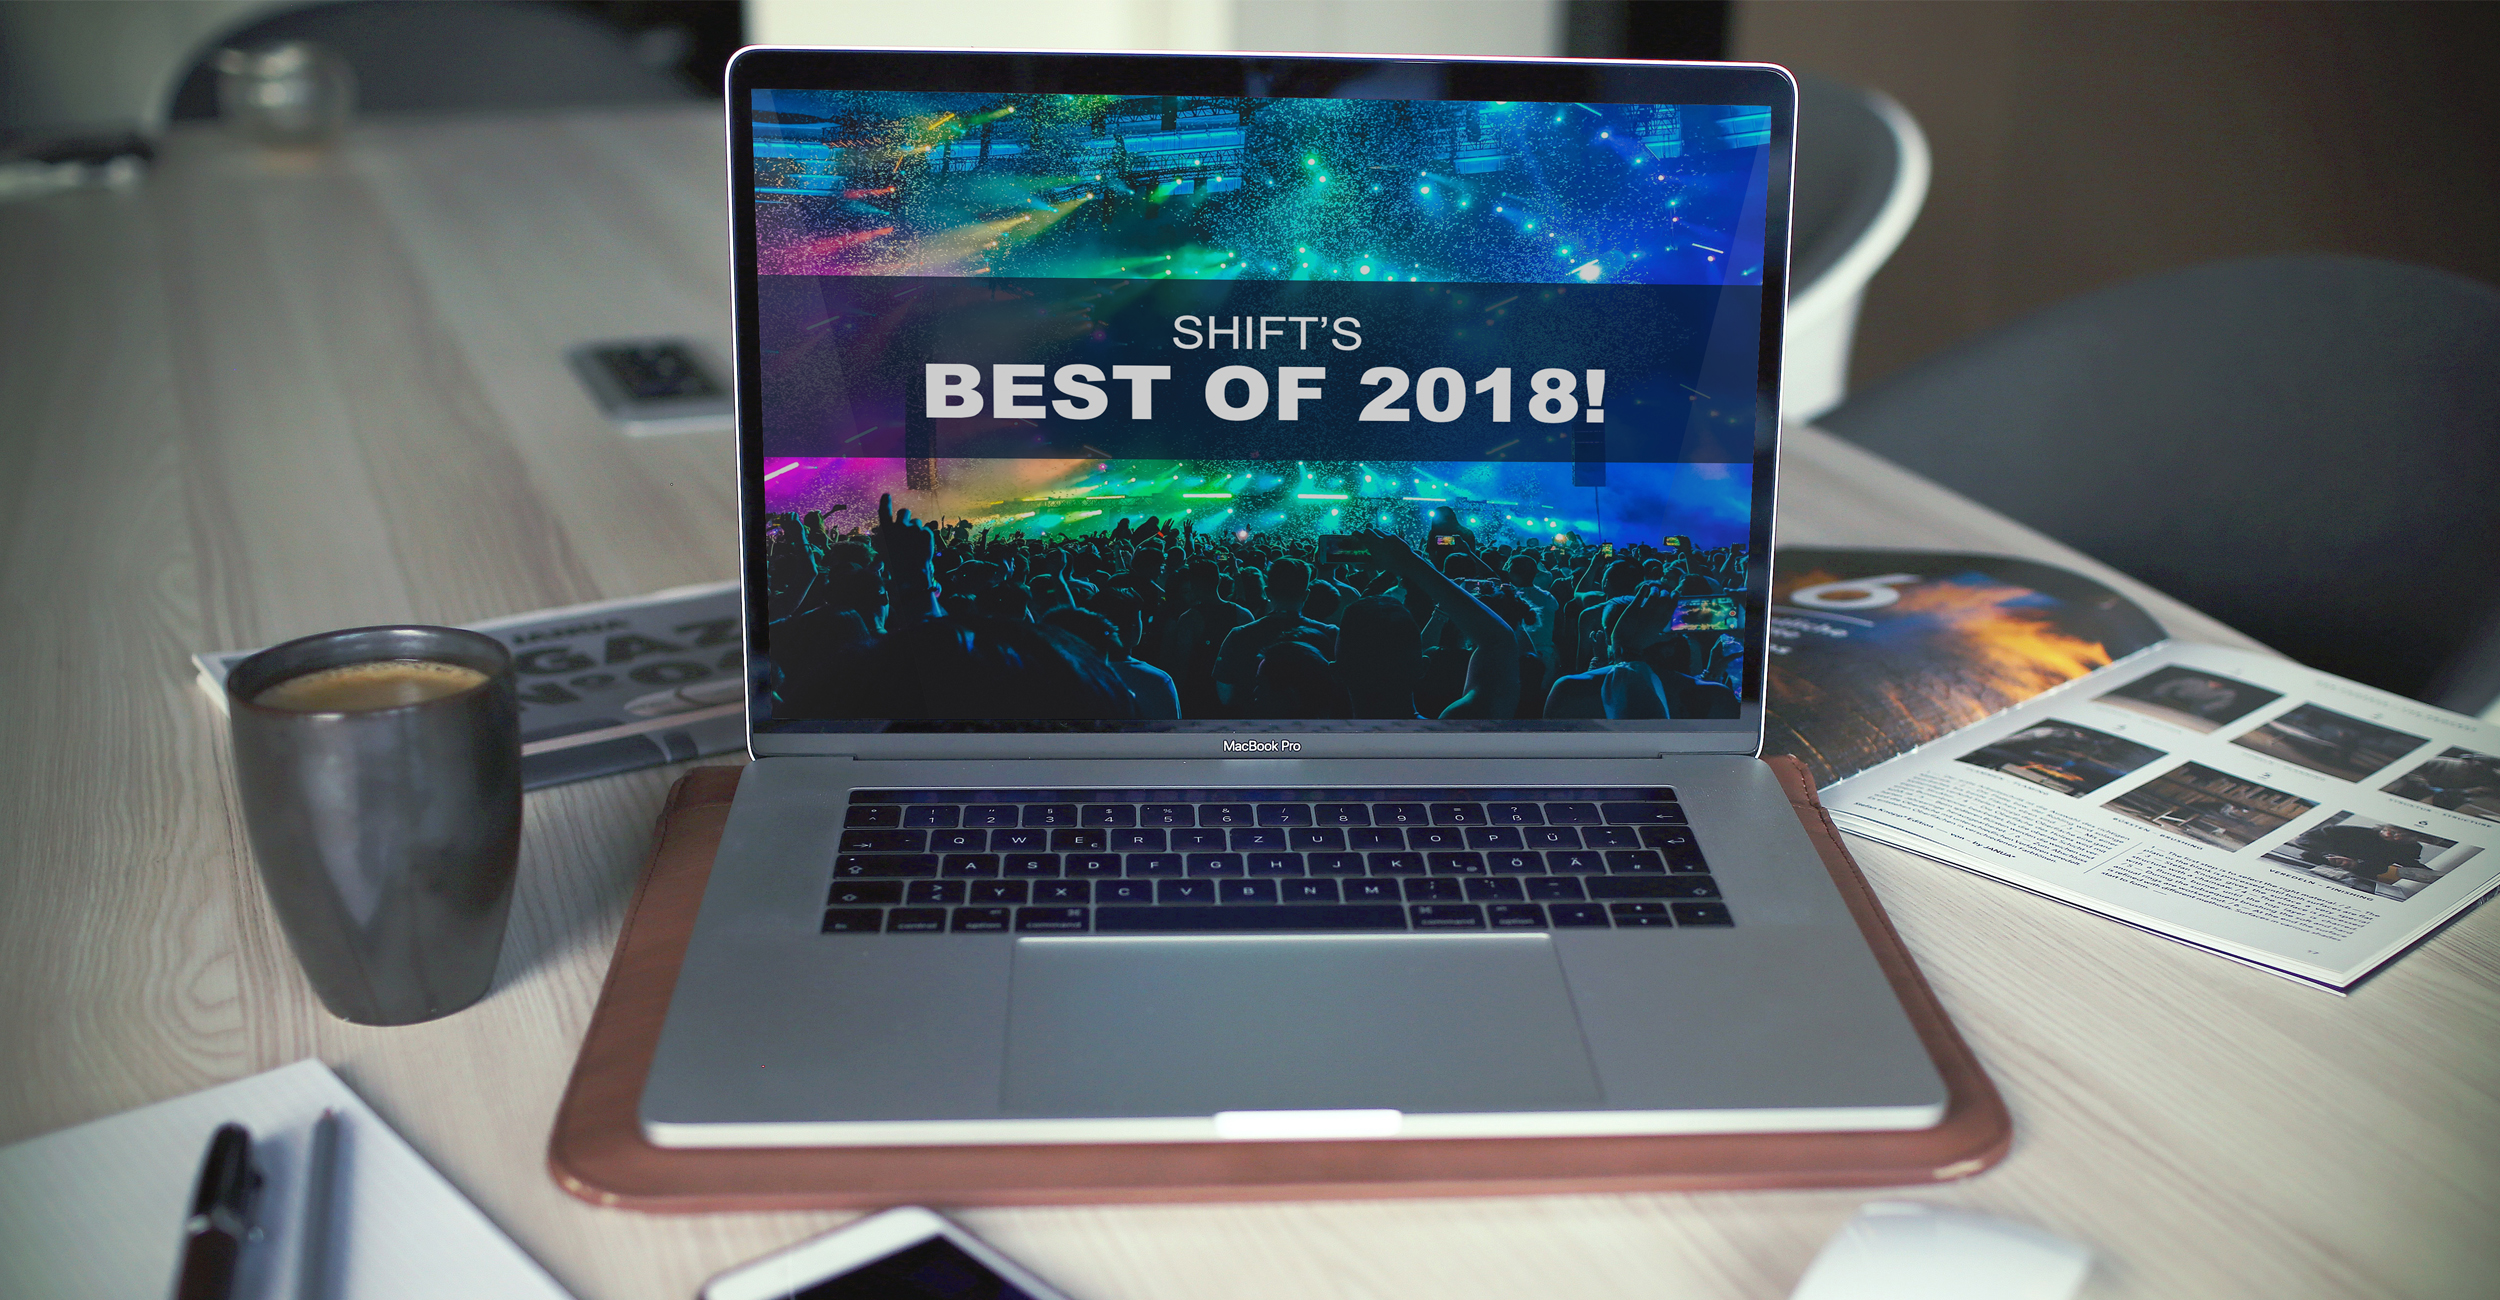 SHIFT Blog - Best of 2018